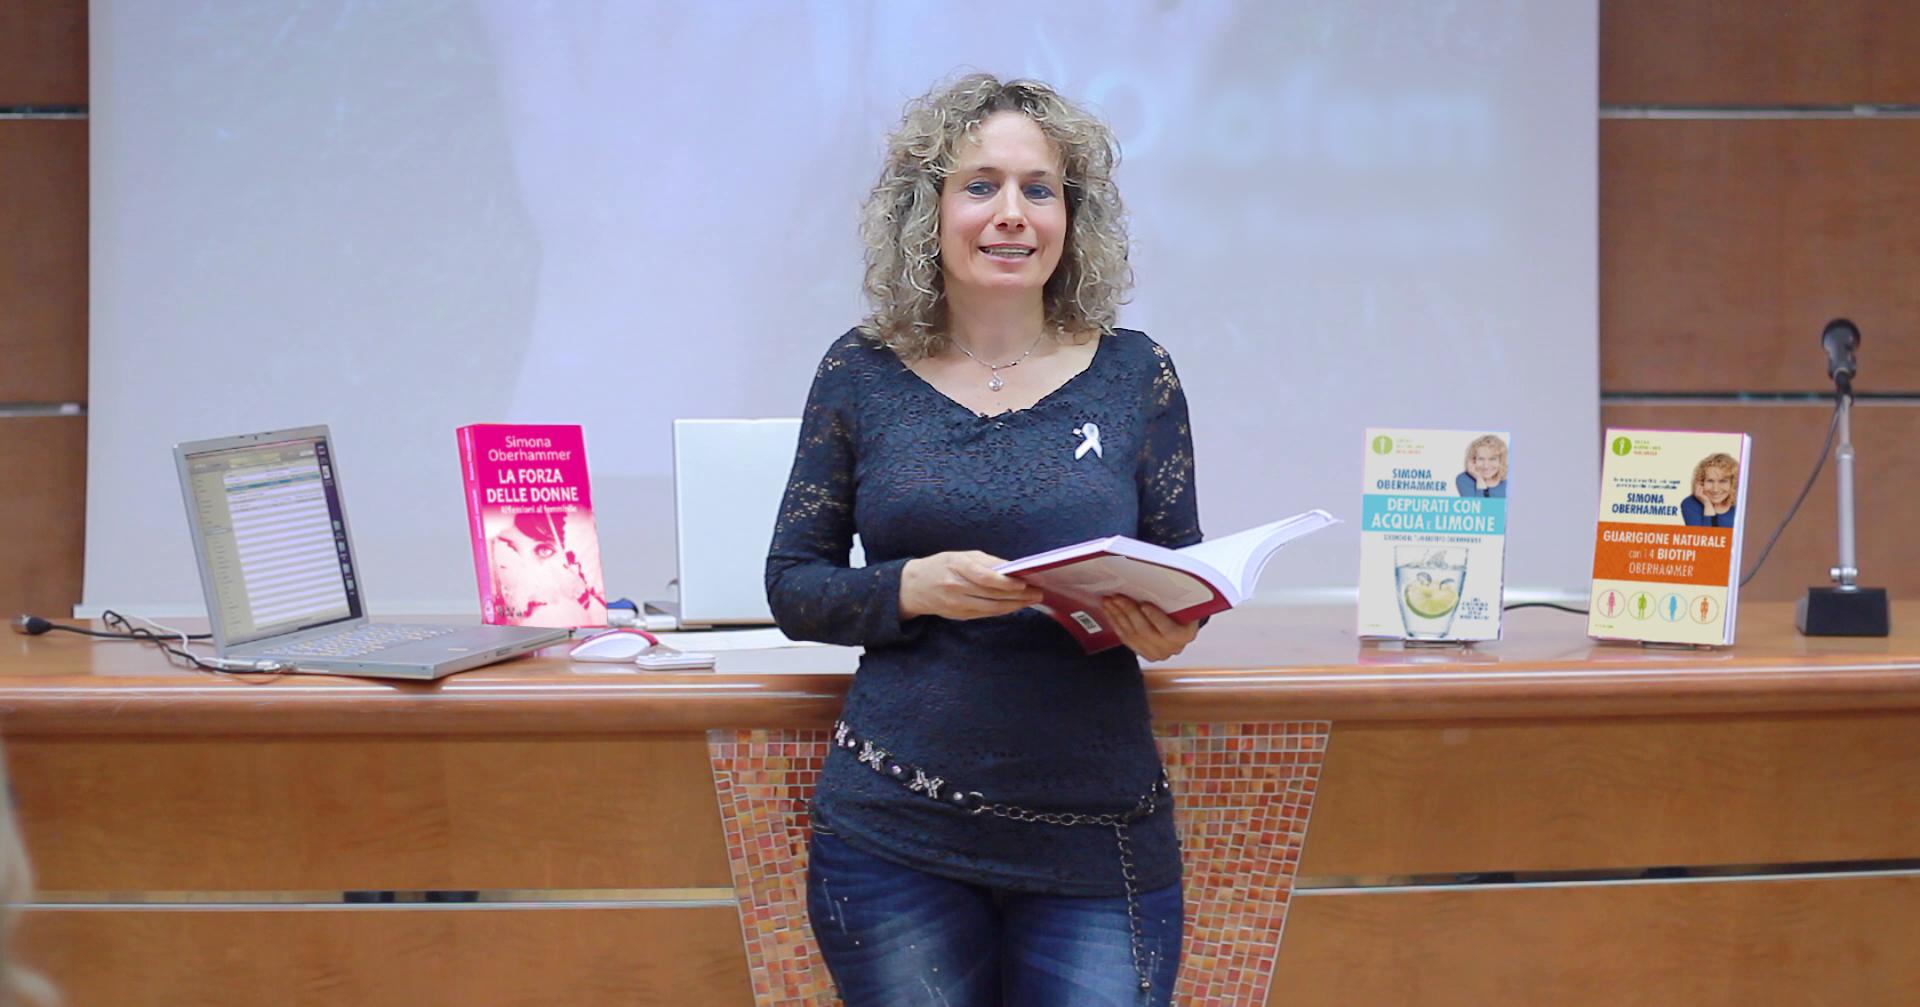 Simona Oberhammer libri